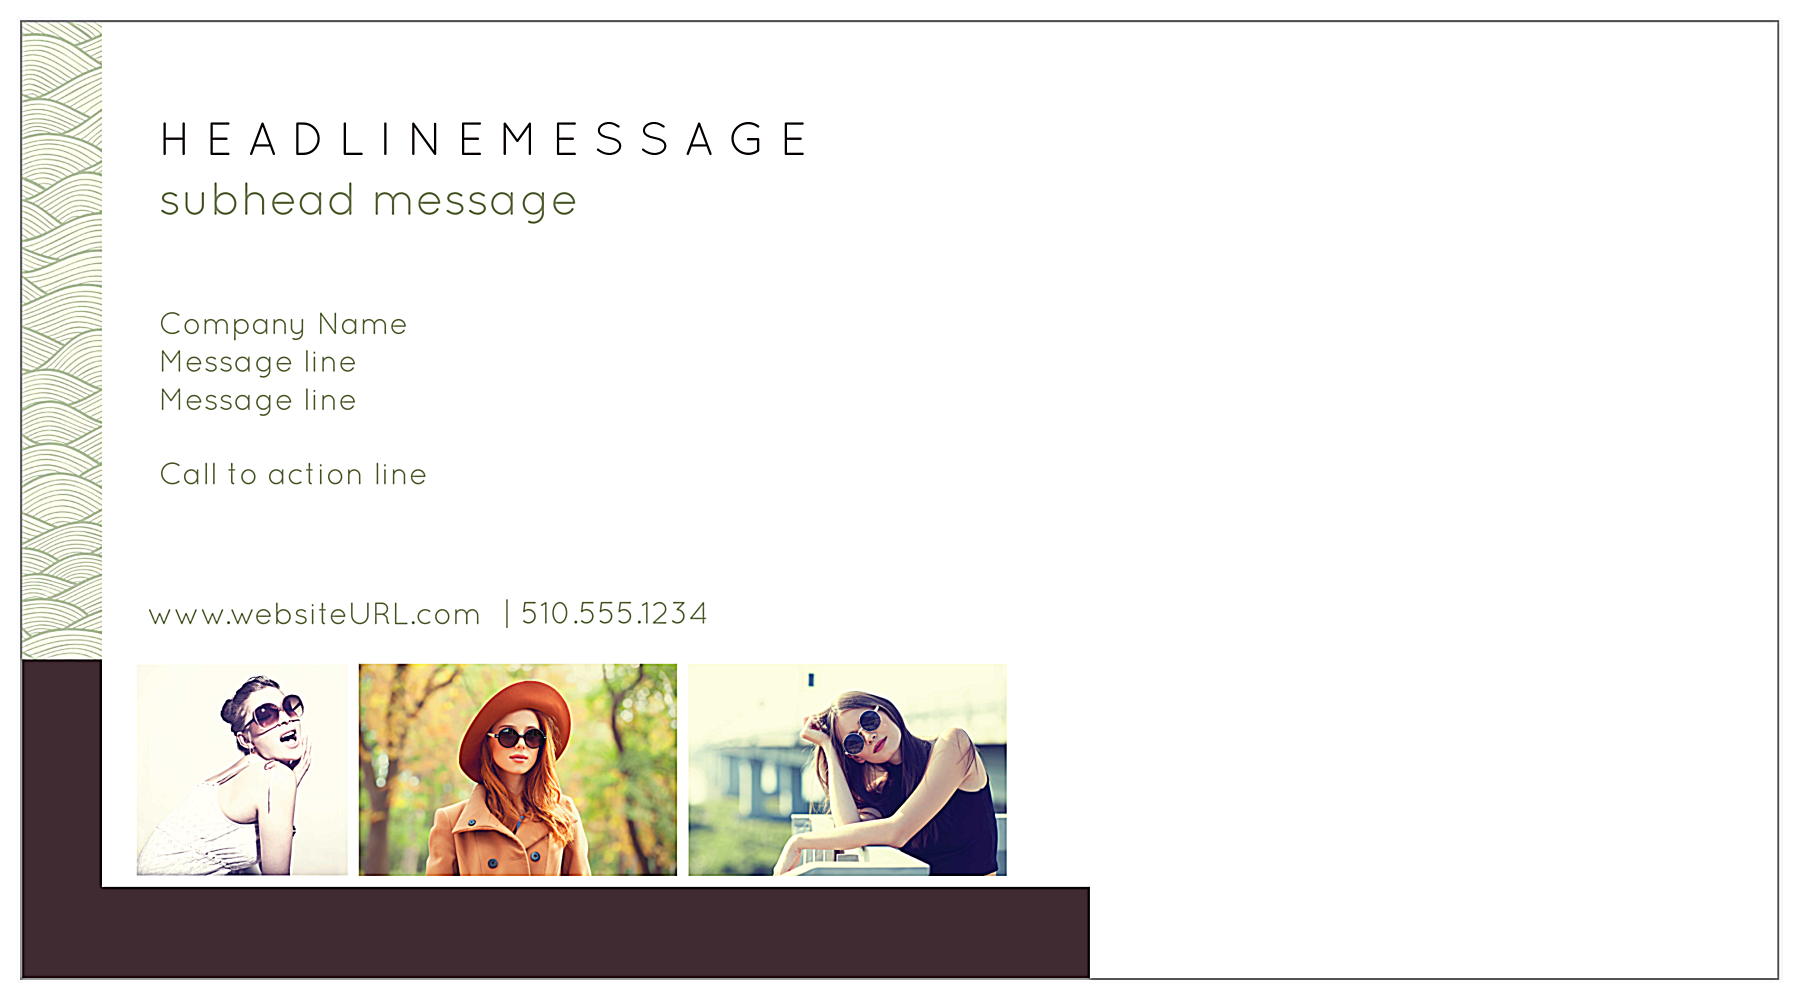 Print Custom Postcards with Our Wavy Sale Design Template back - Postcards Maker